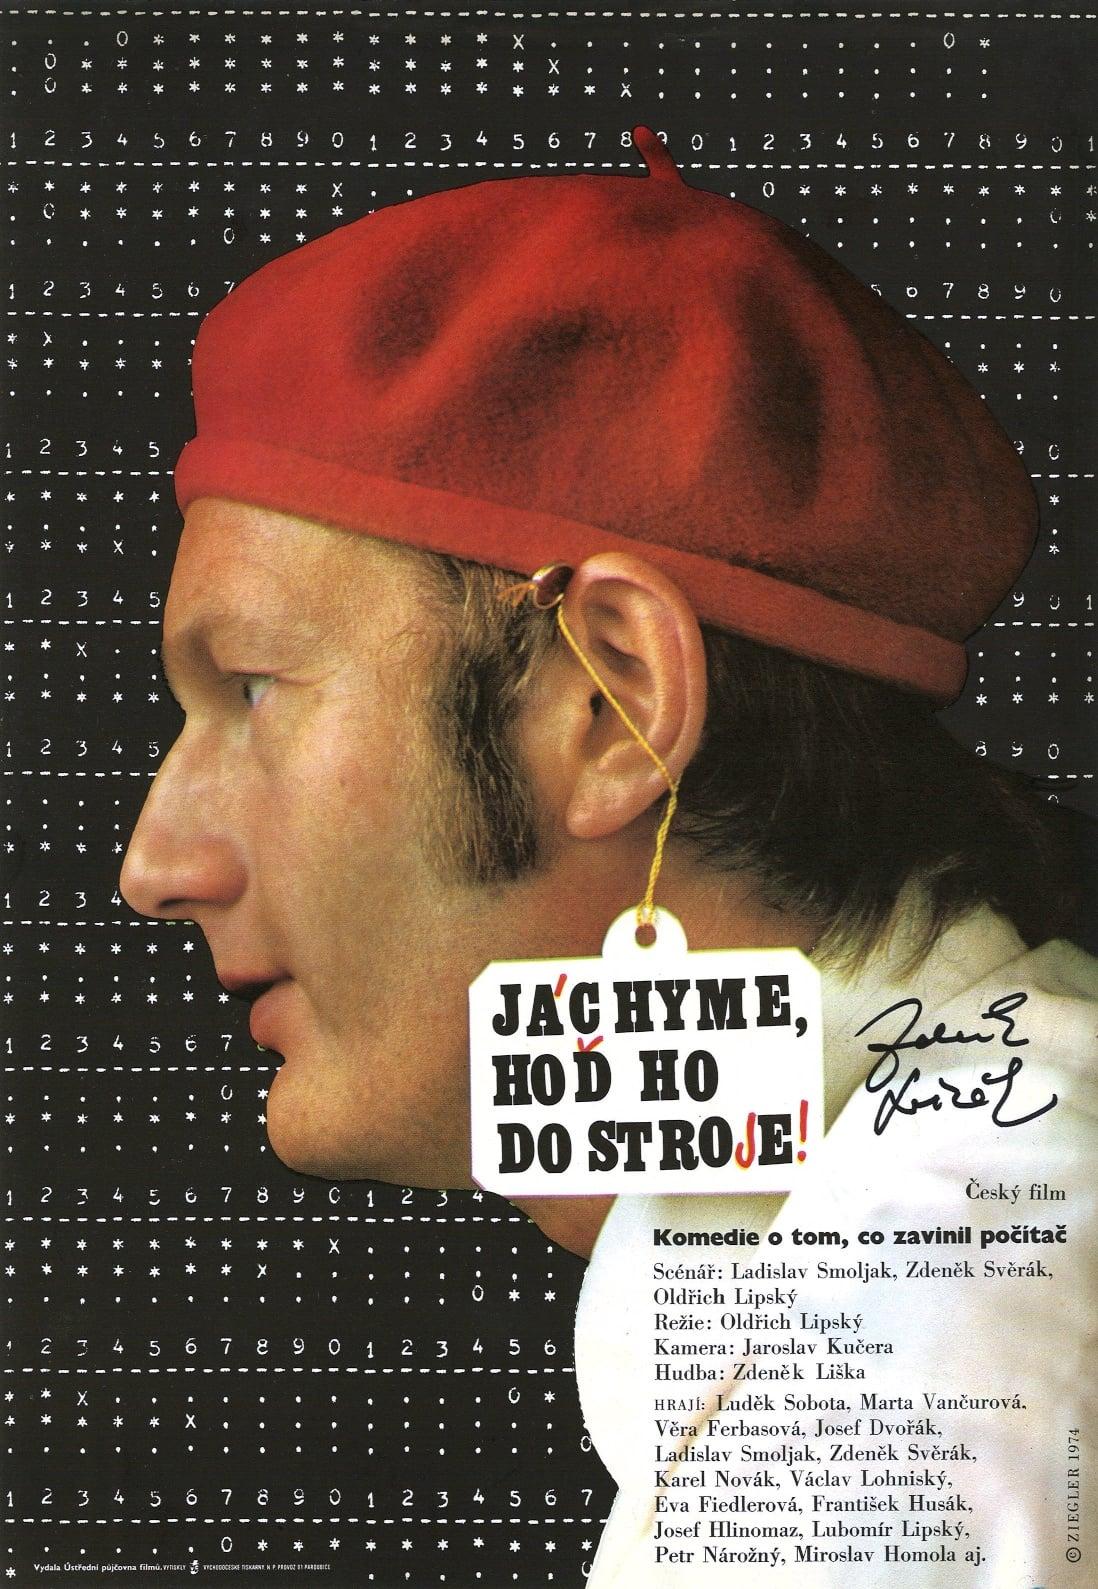 Joachim, Put It in the Machine